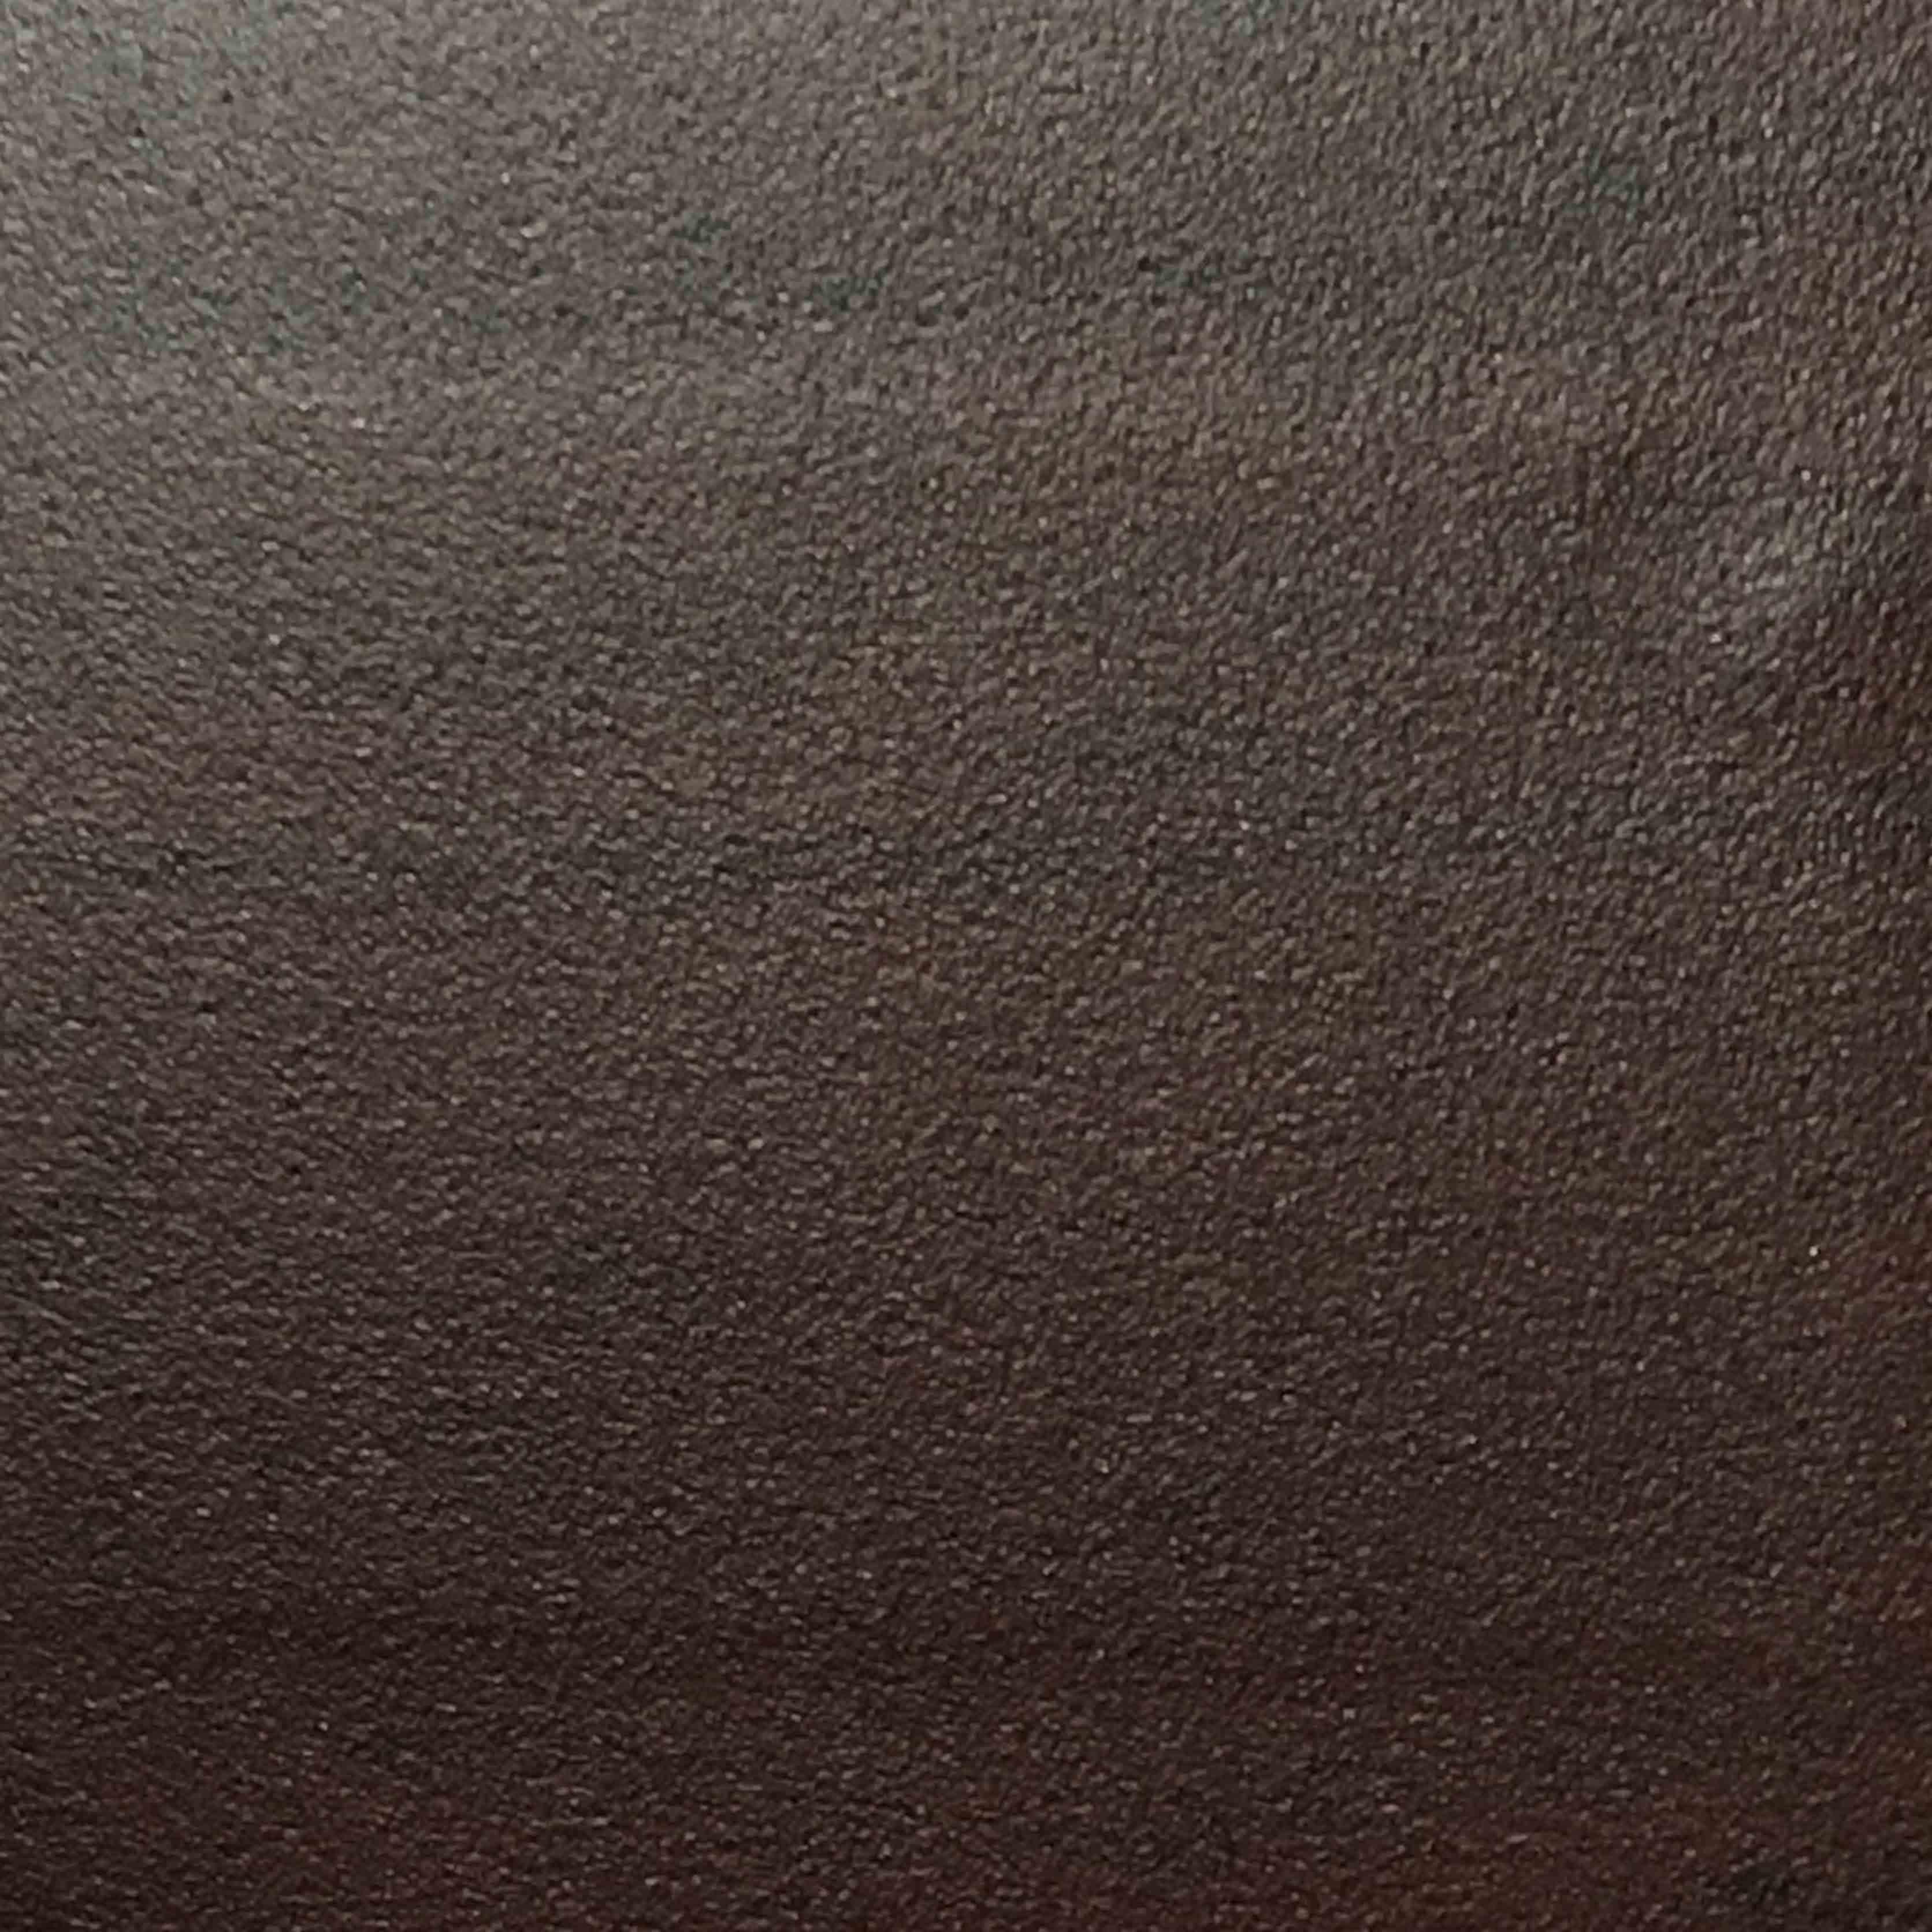 Decal vân gỗ - 3903-2